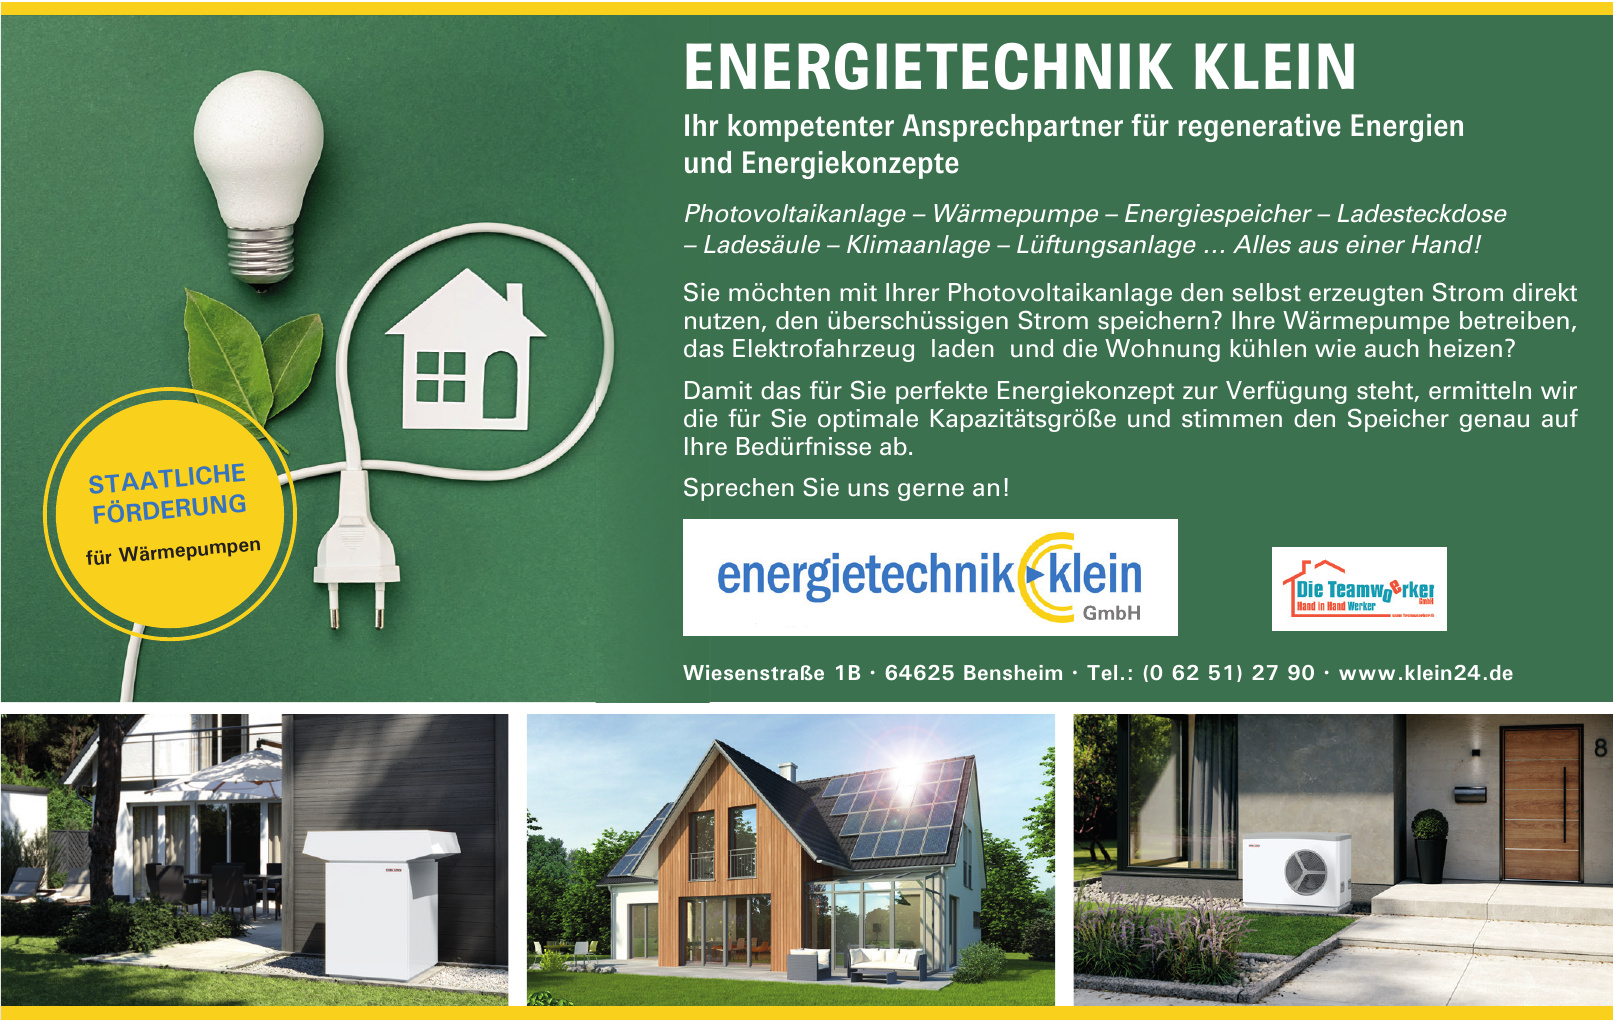 Energietechnik Klein